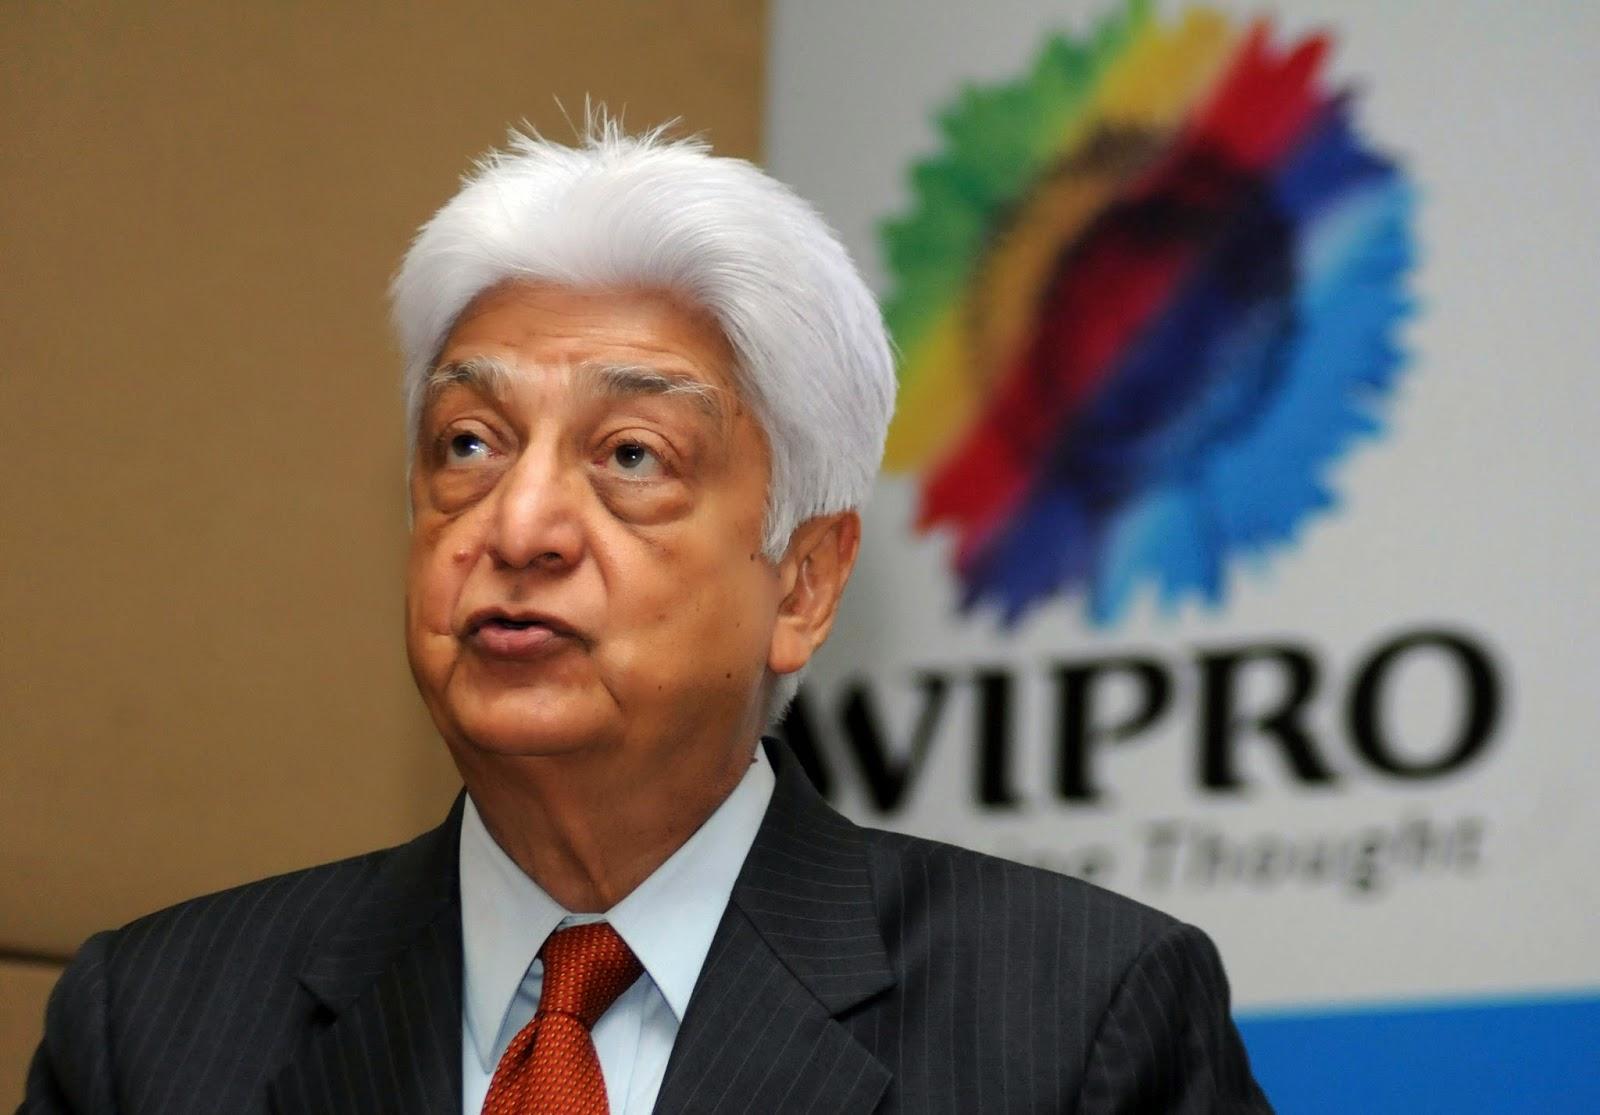 "<img src=""http://2.bp.blogspot.com/-xohlsPYcJyw/U4dkGA0MtgI/AAAAAAAAACE/25n7JkxET2A/s1600/azim-Premji-richest-man-in-india.jpg"" alt=""RICHEST MAN IN INDIA"" />"